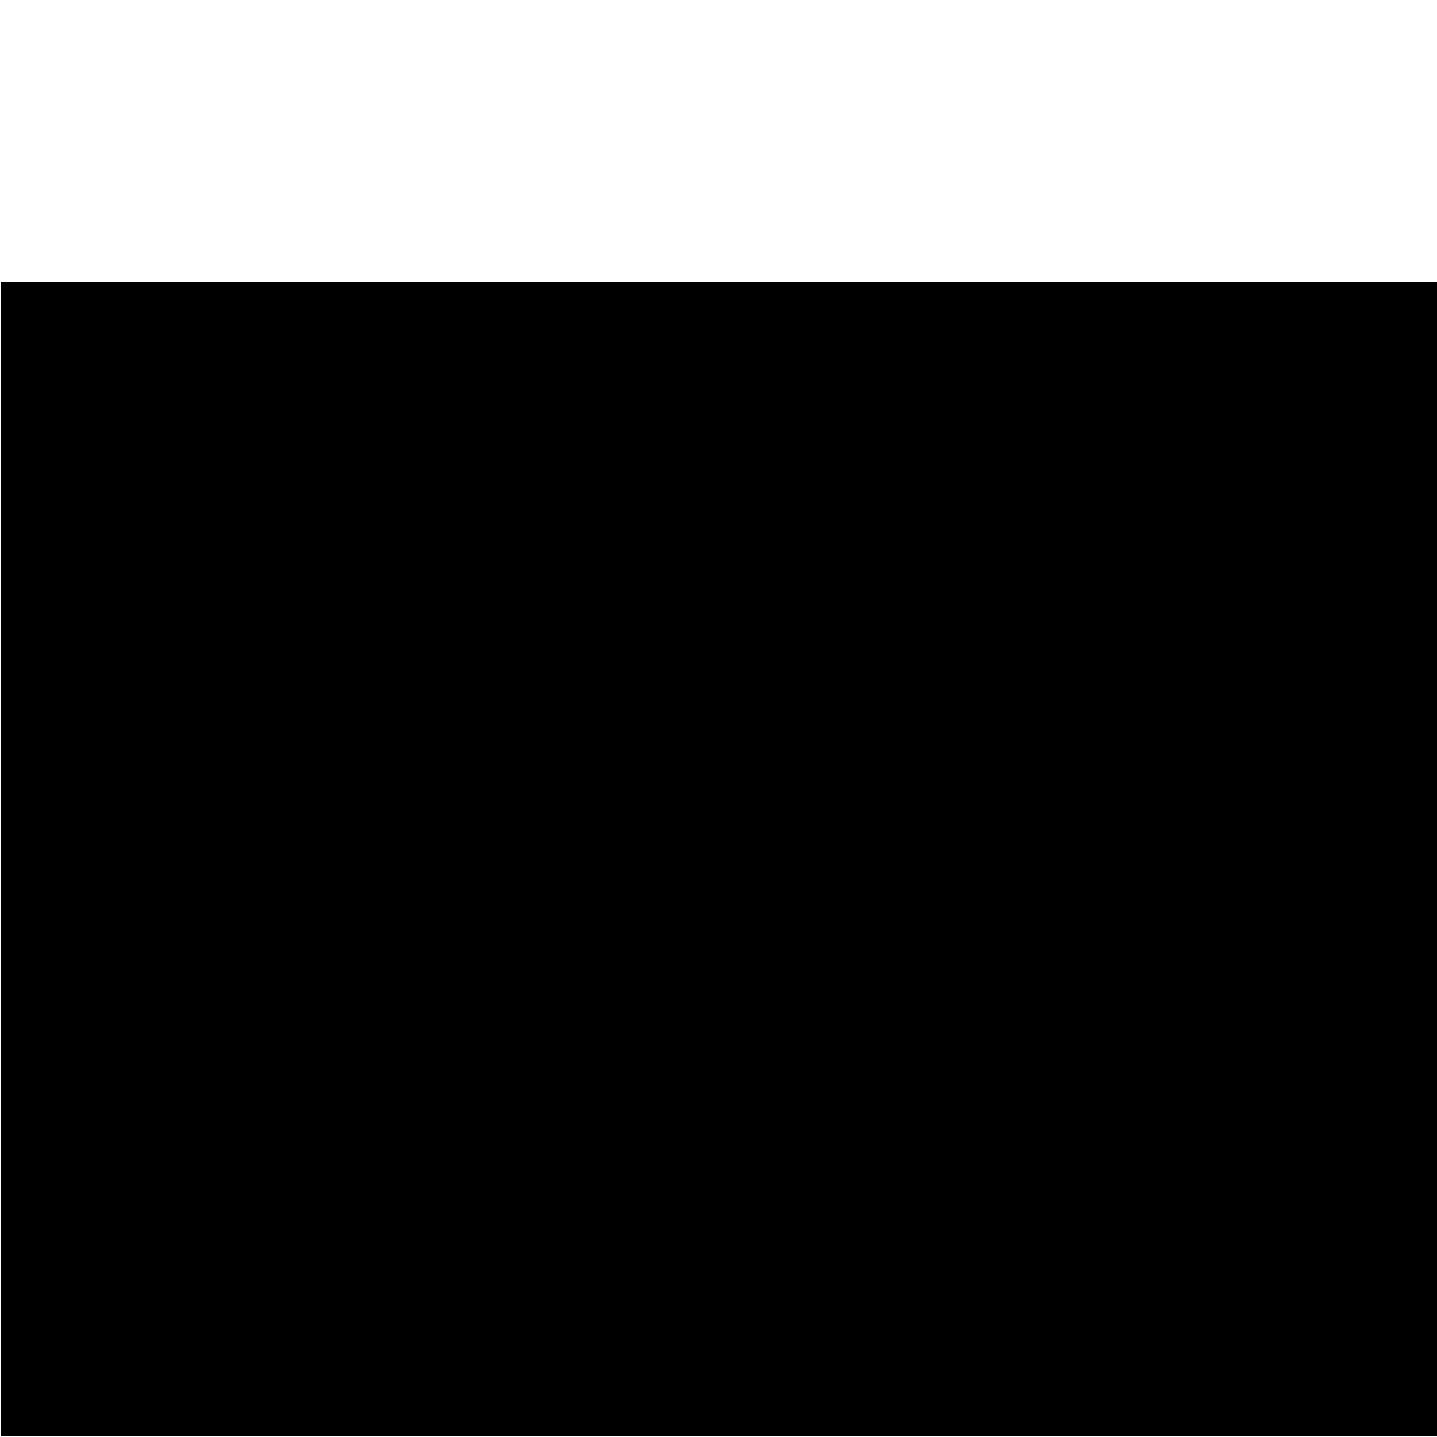 Jet Ski PNG Image